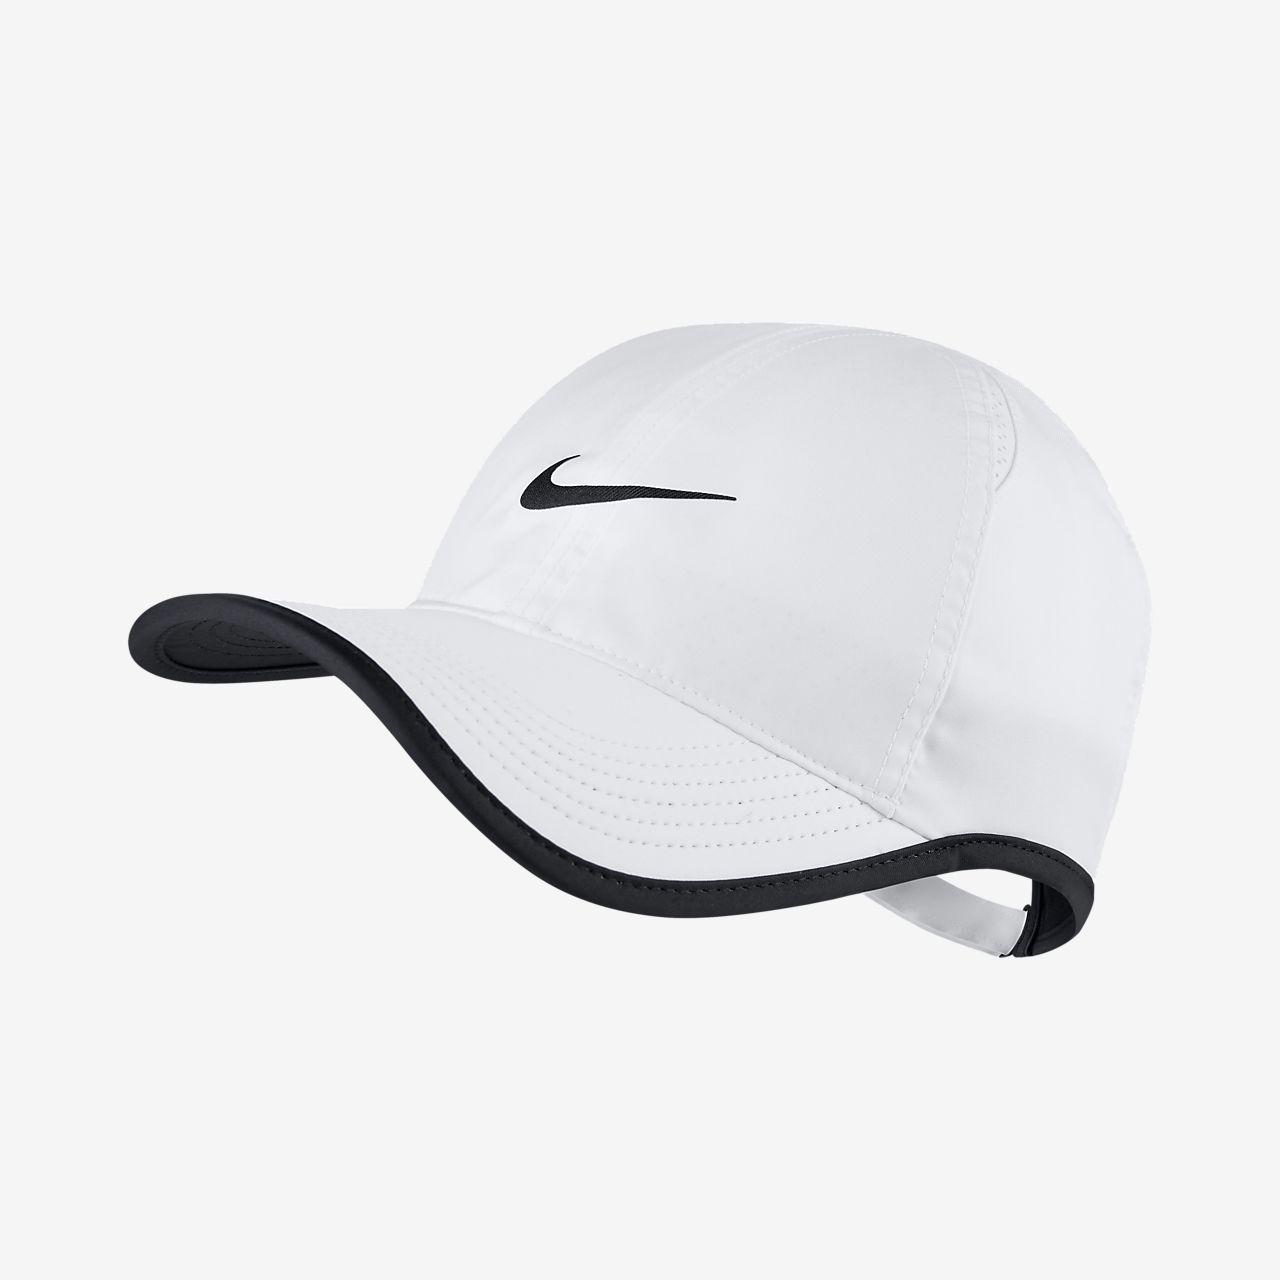 364e0d3b8f954 NikeCourt AeroBill Featherlight Tennis Cap. Nike.com SE